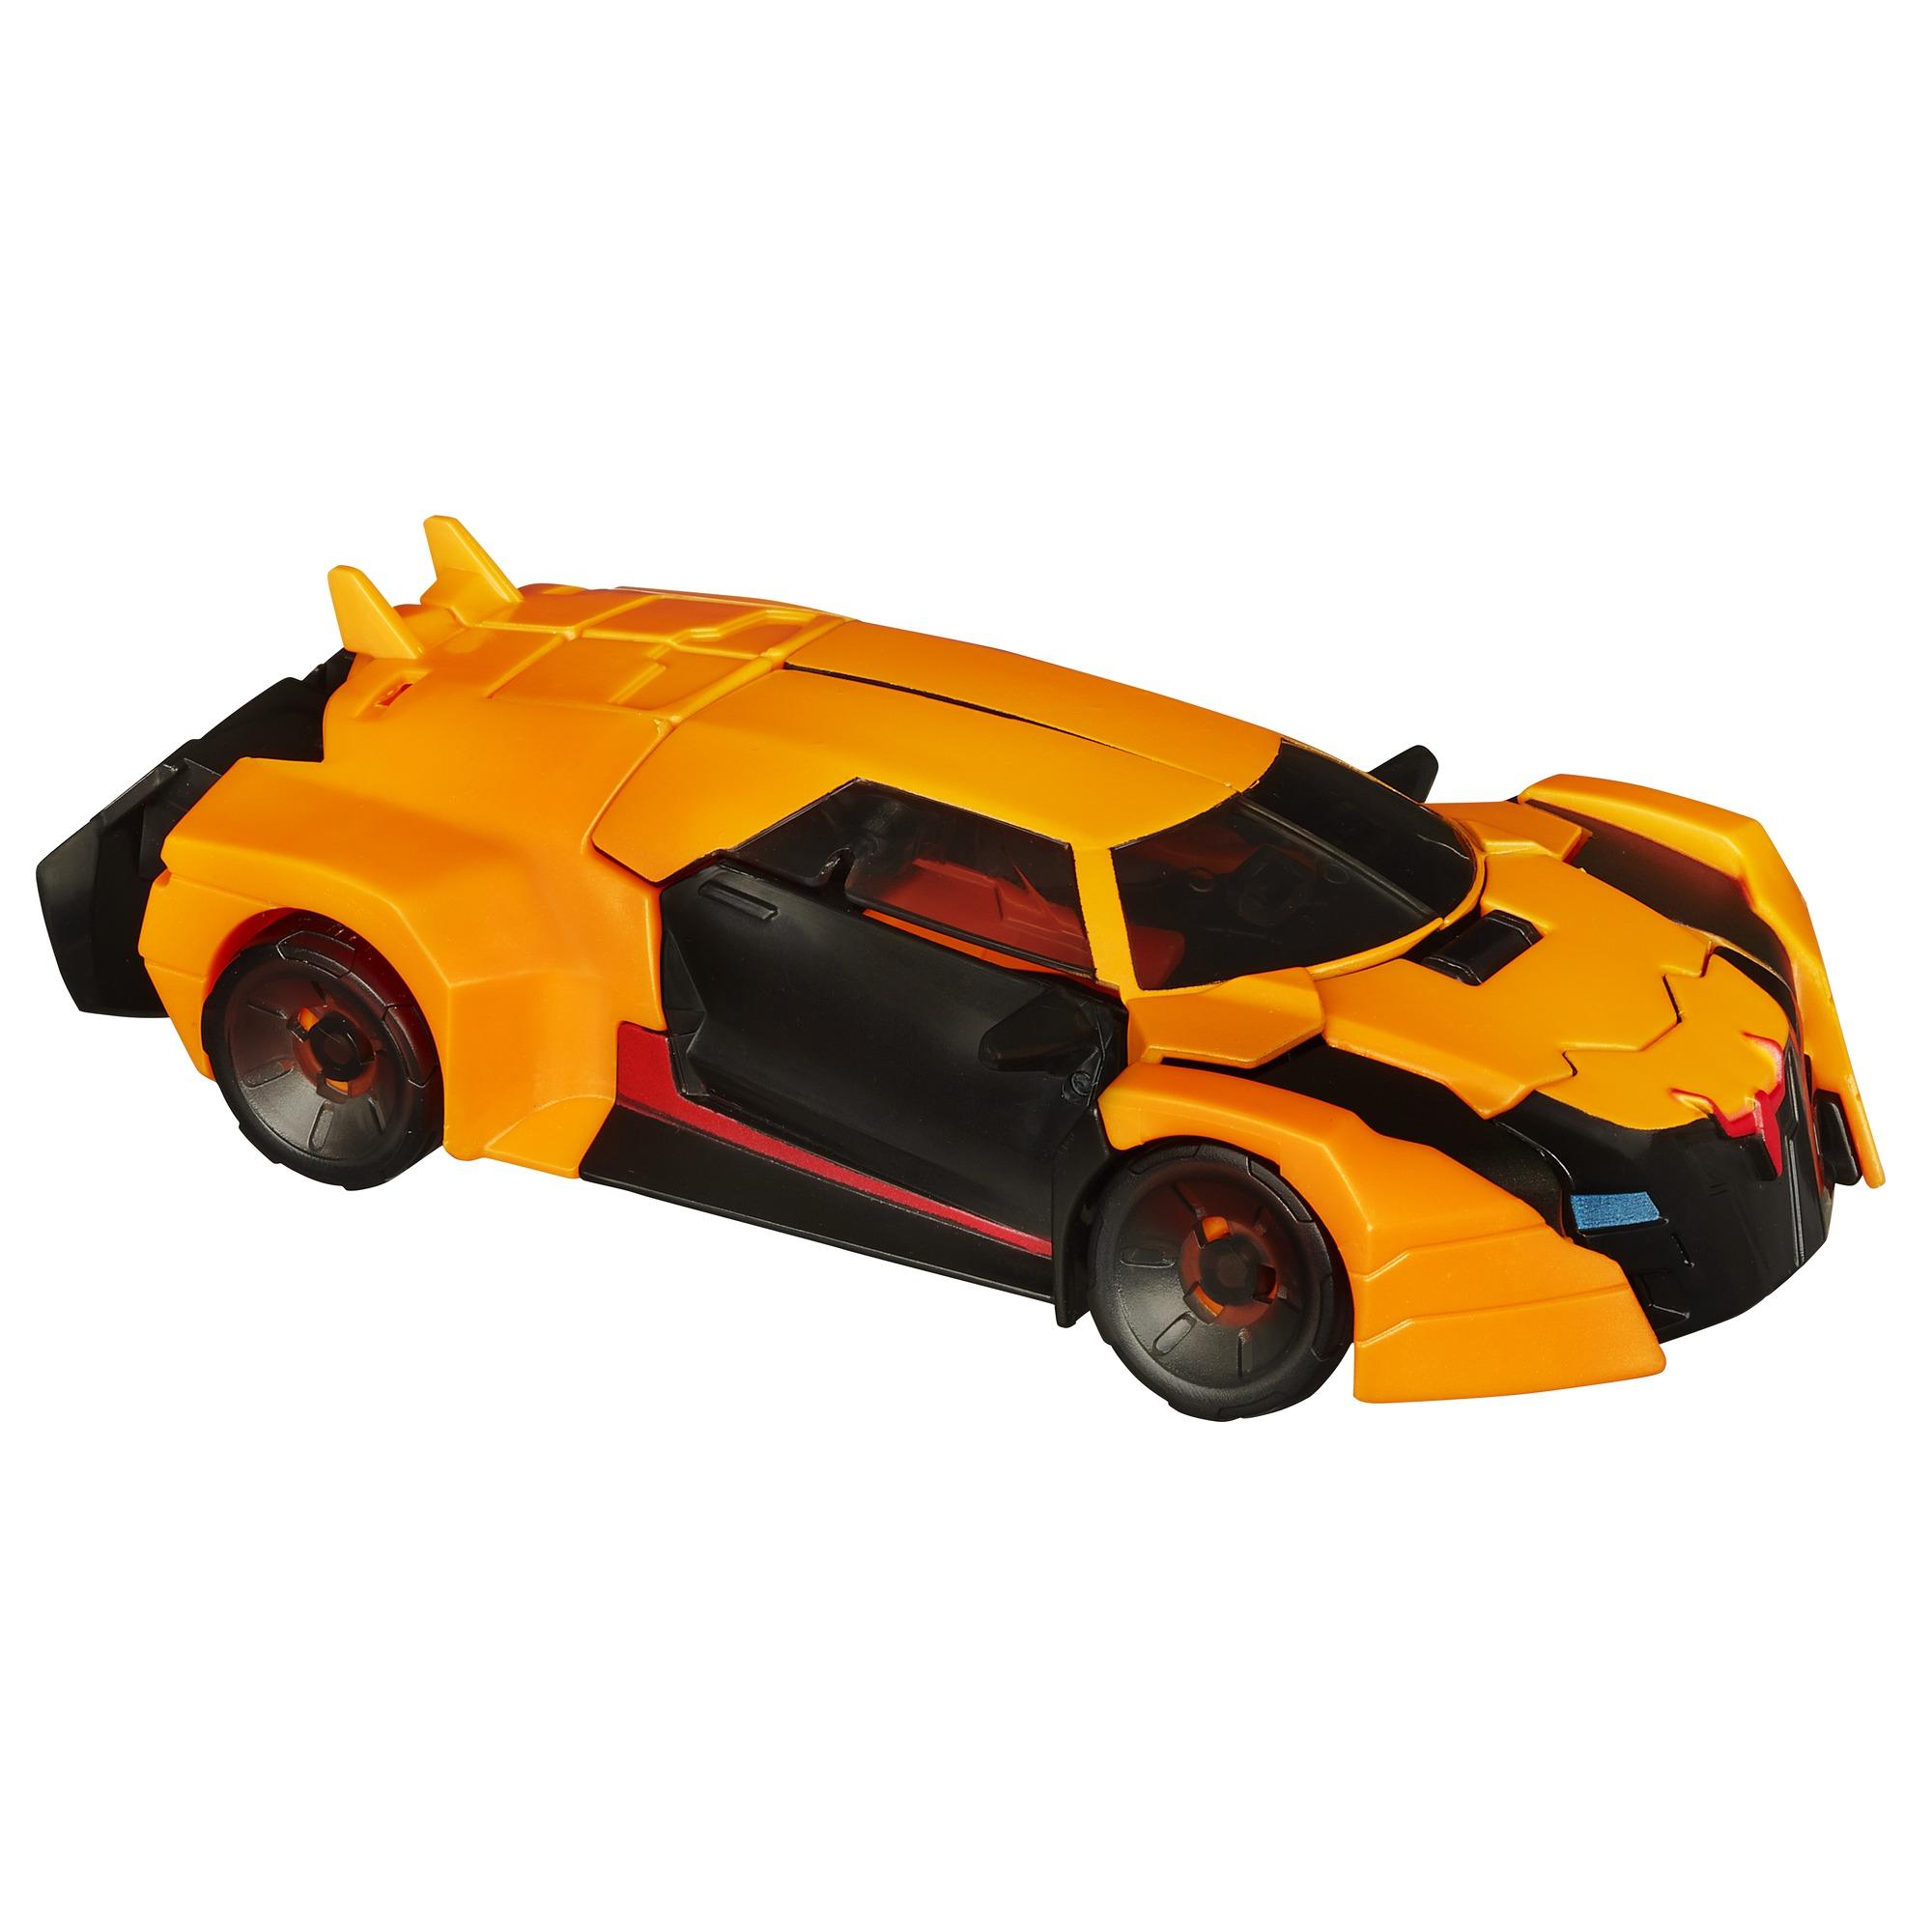 Transformers Robots in Disguise Warrior Class Autobot Drift Figure PartNumber: 004W006023602007P